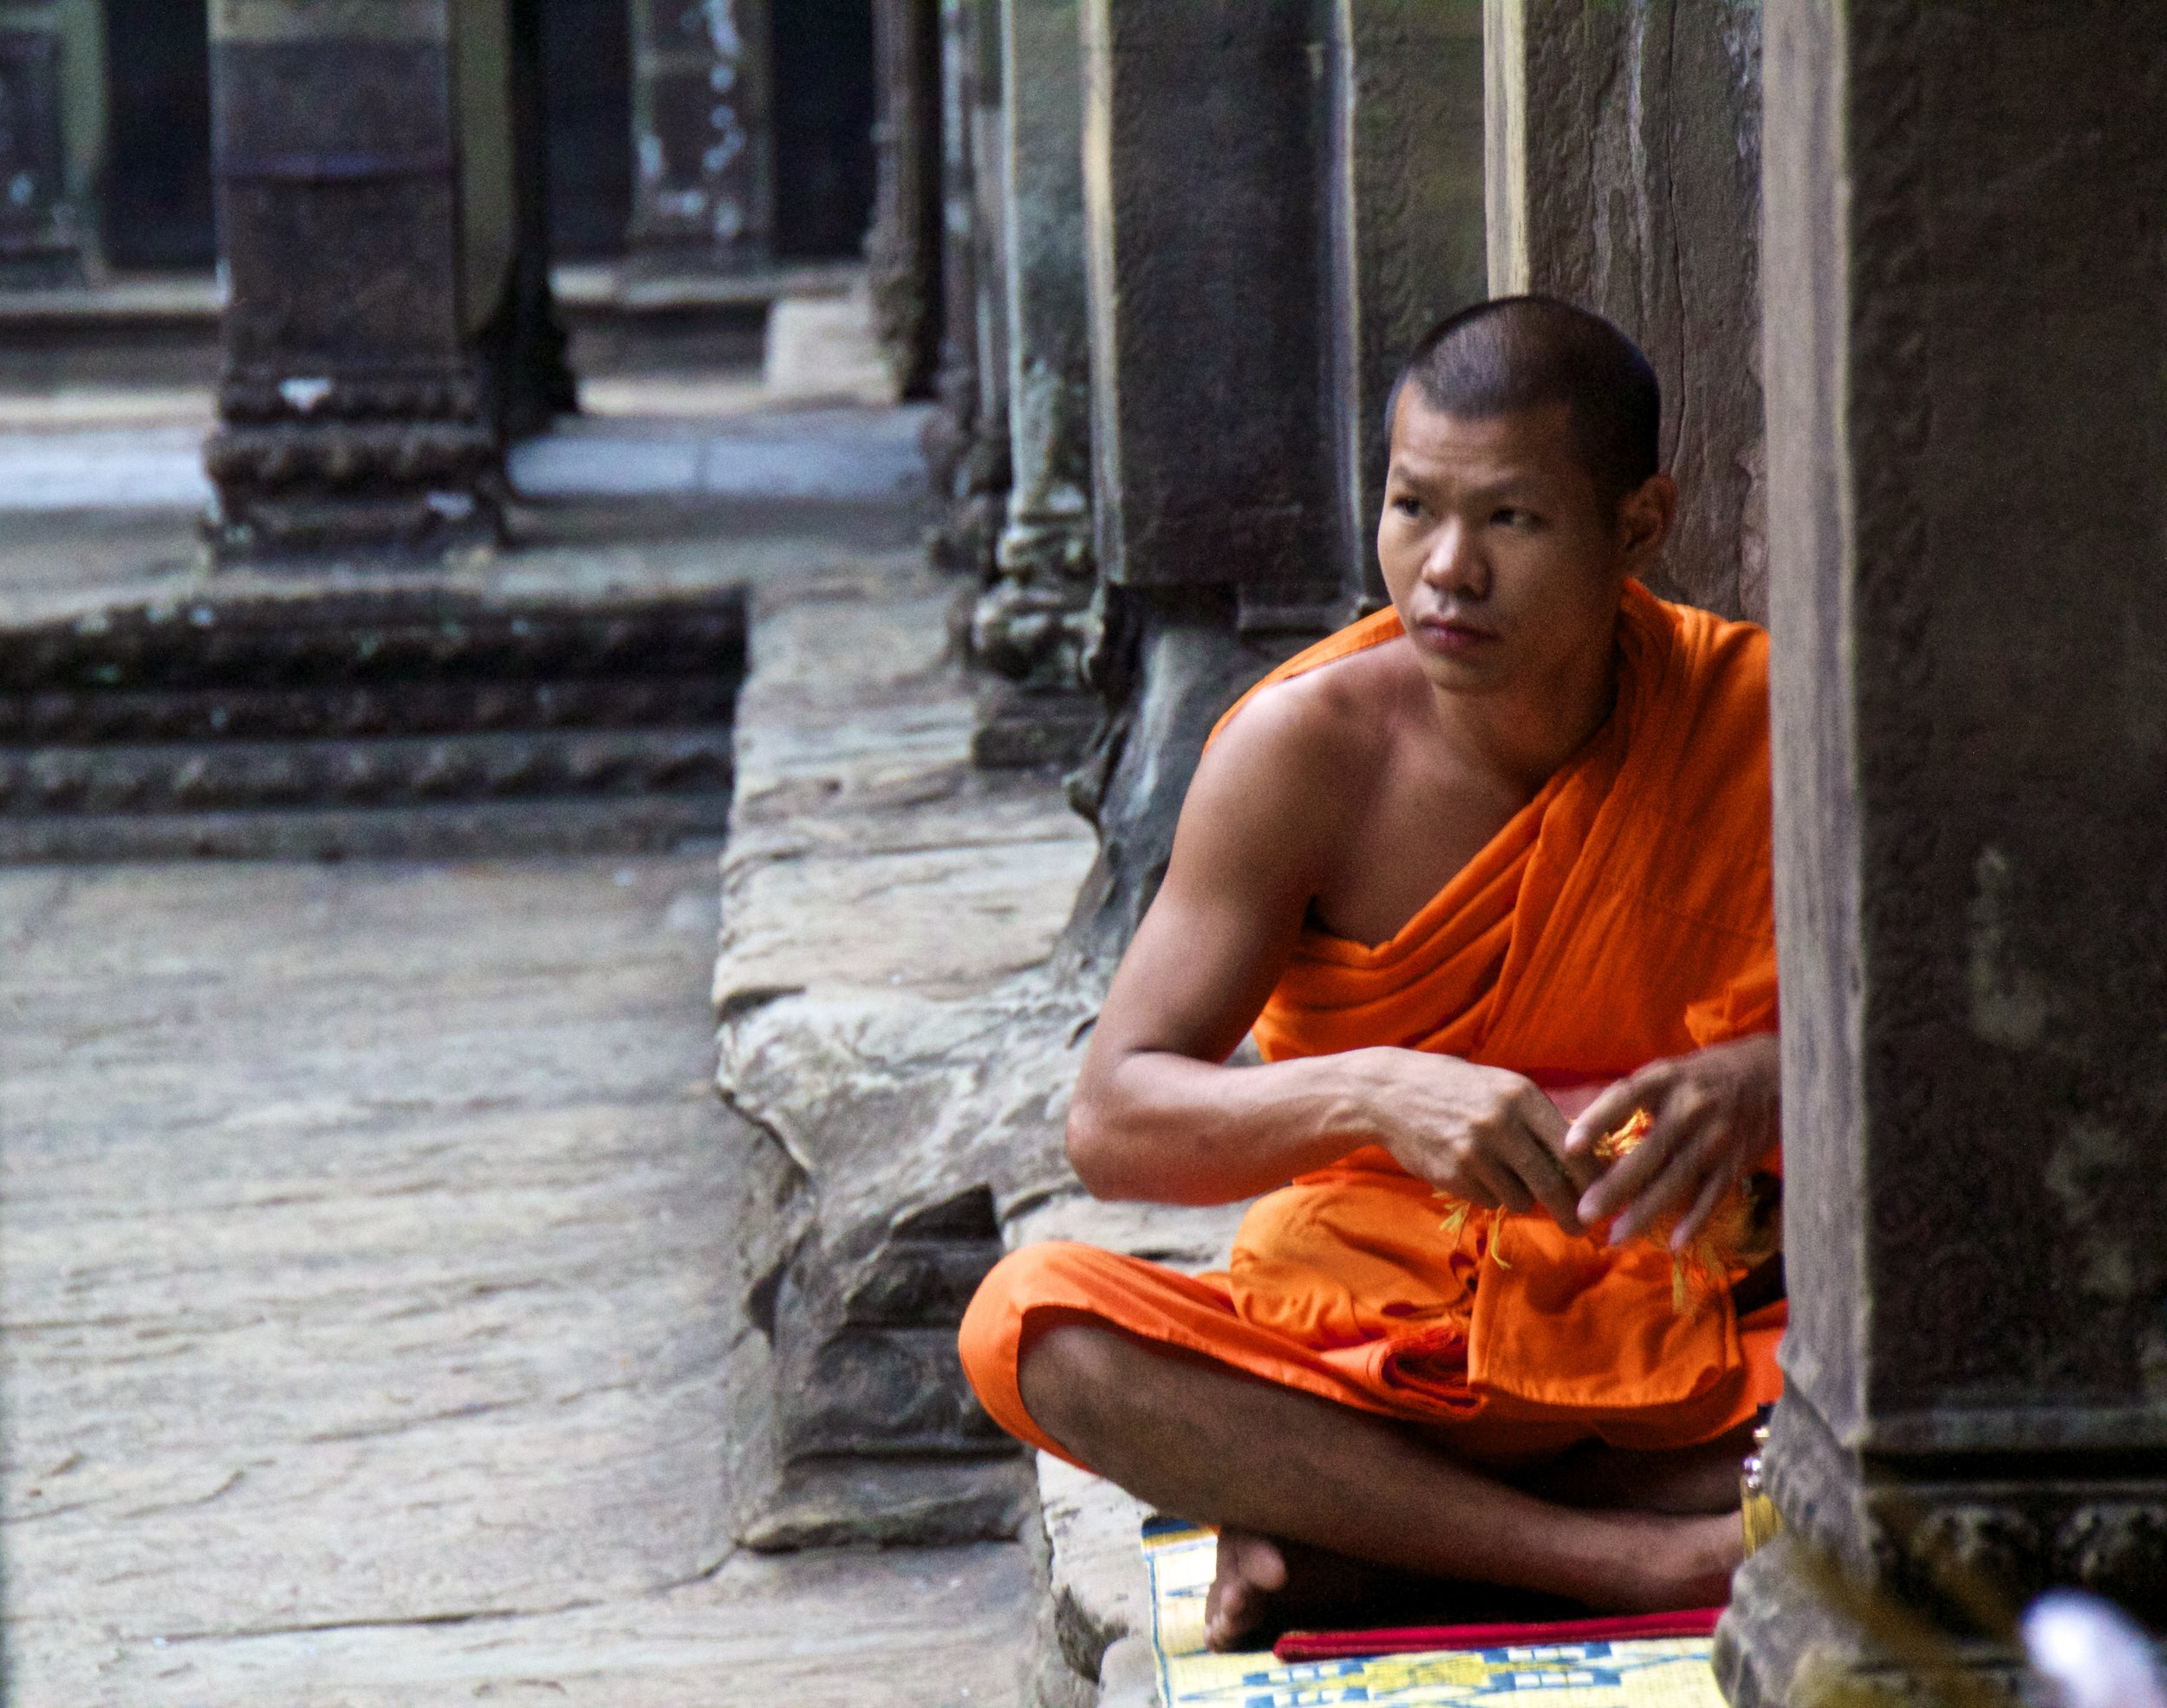 angkor wat siem reap cambodia 1.jpg